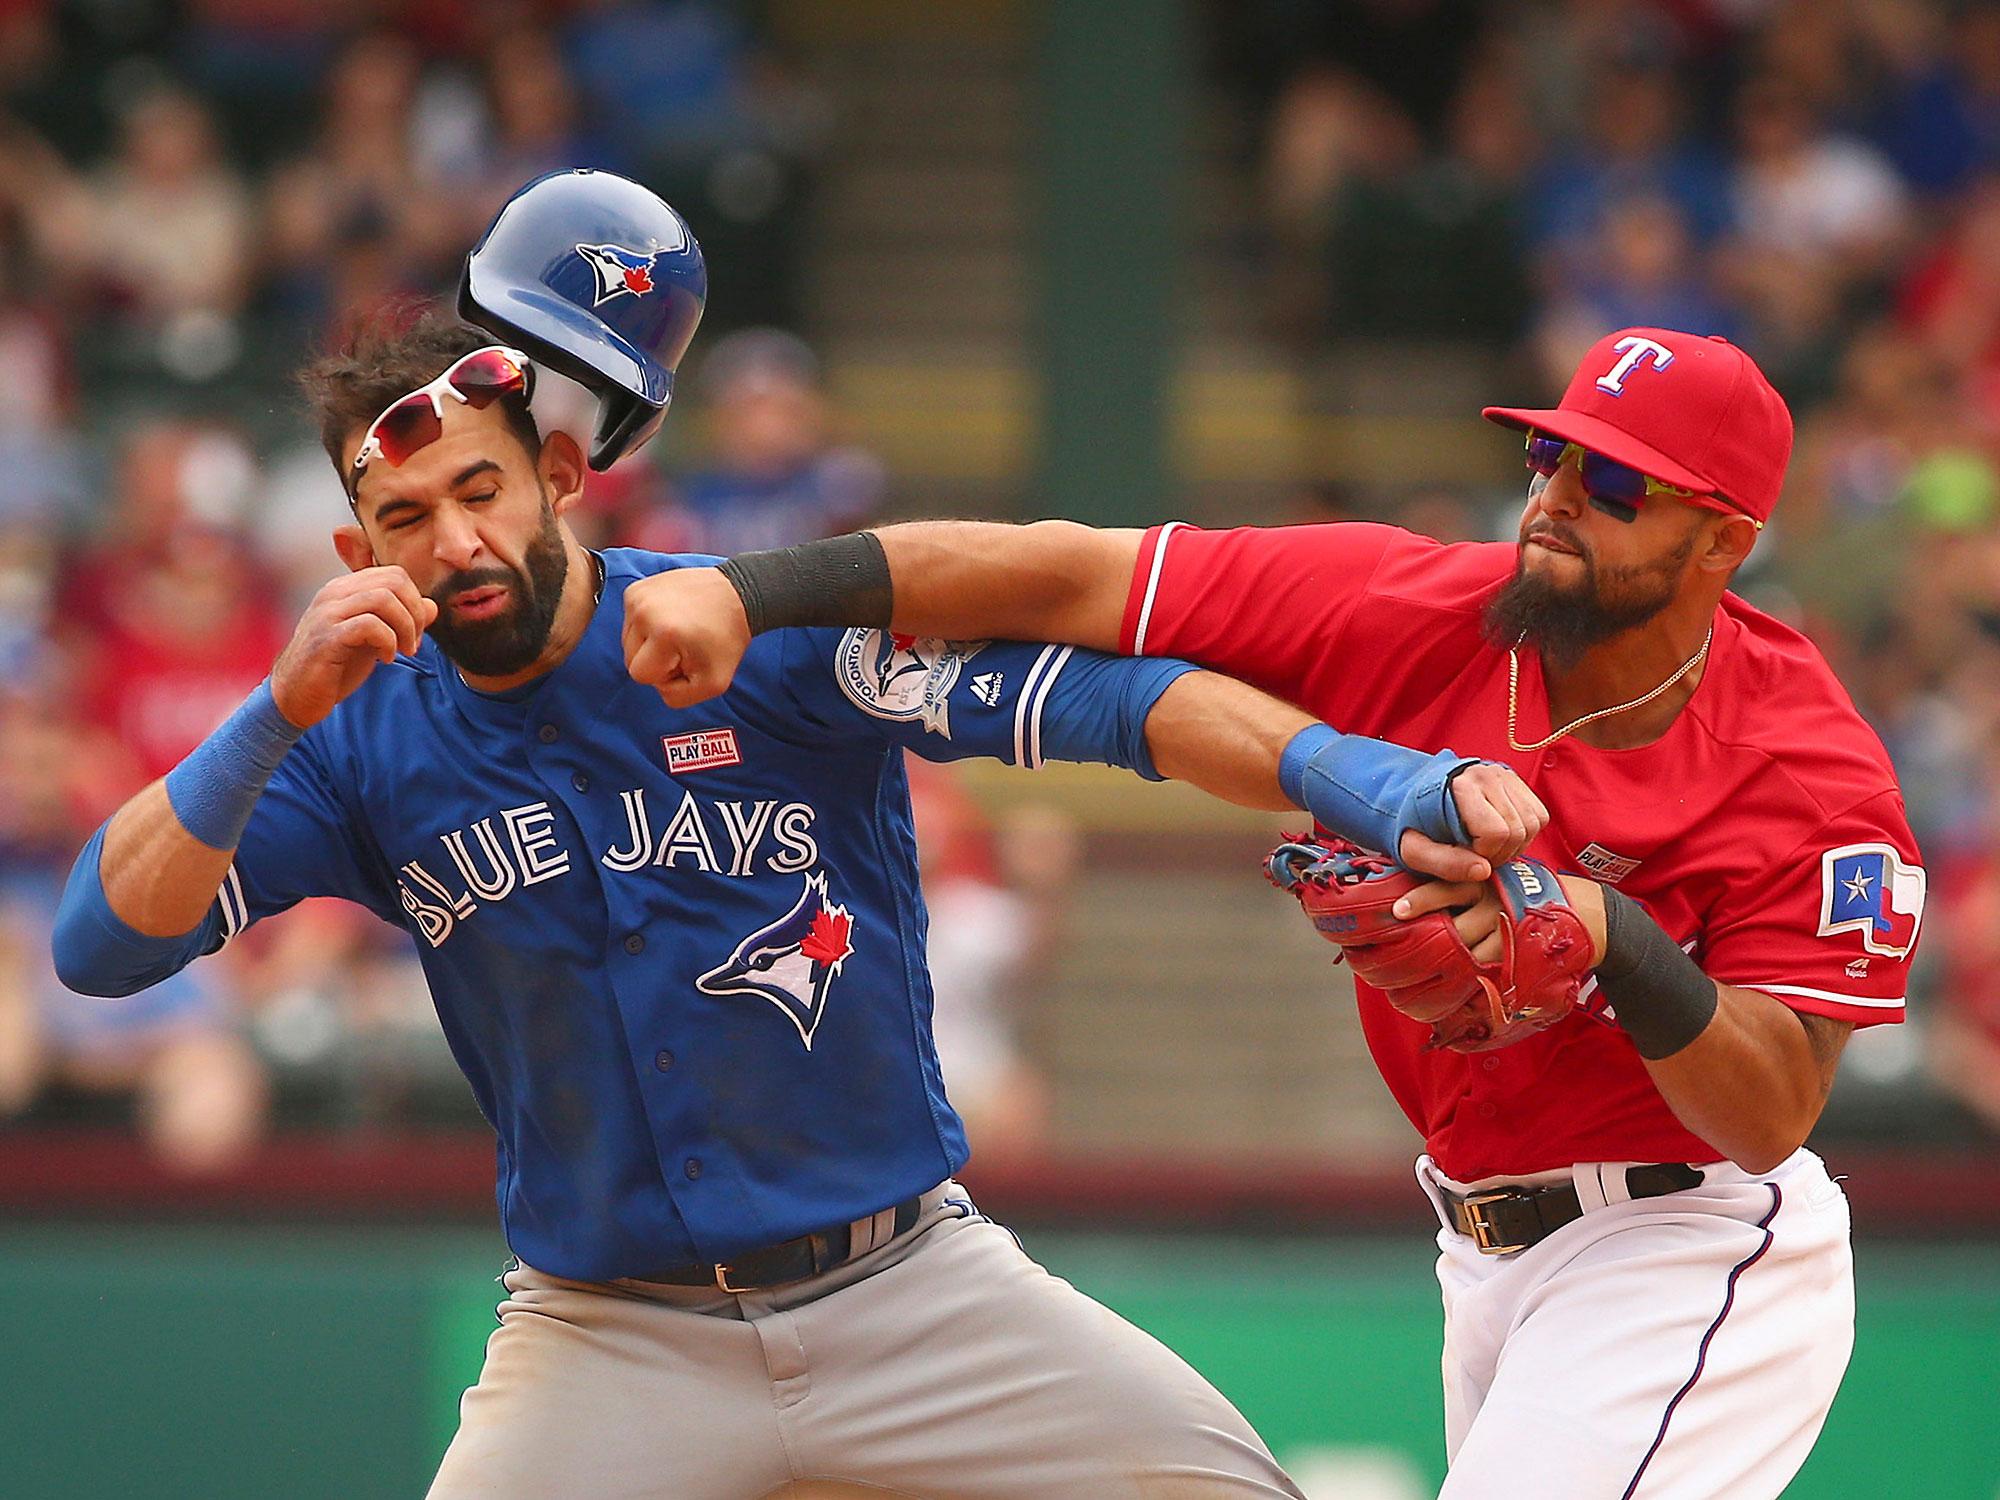 Rougned Odor, Texas Rangers; Jose Bautista, Toronto Blue Jays